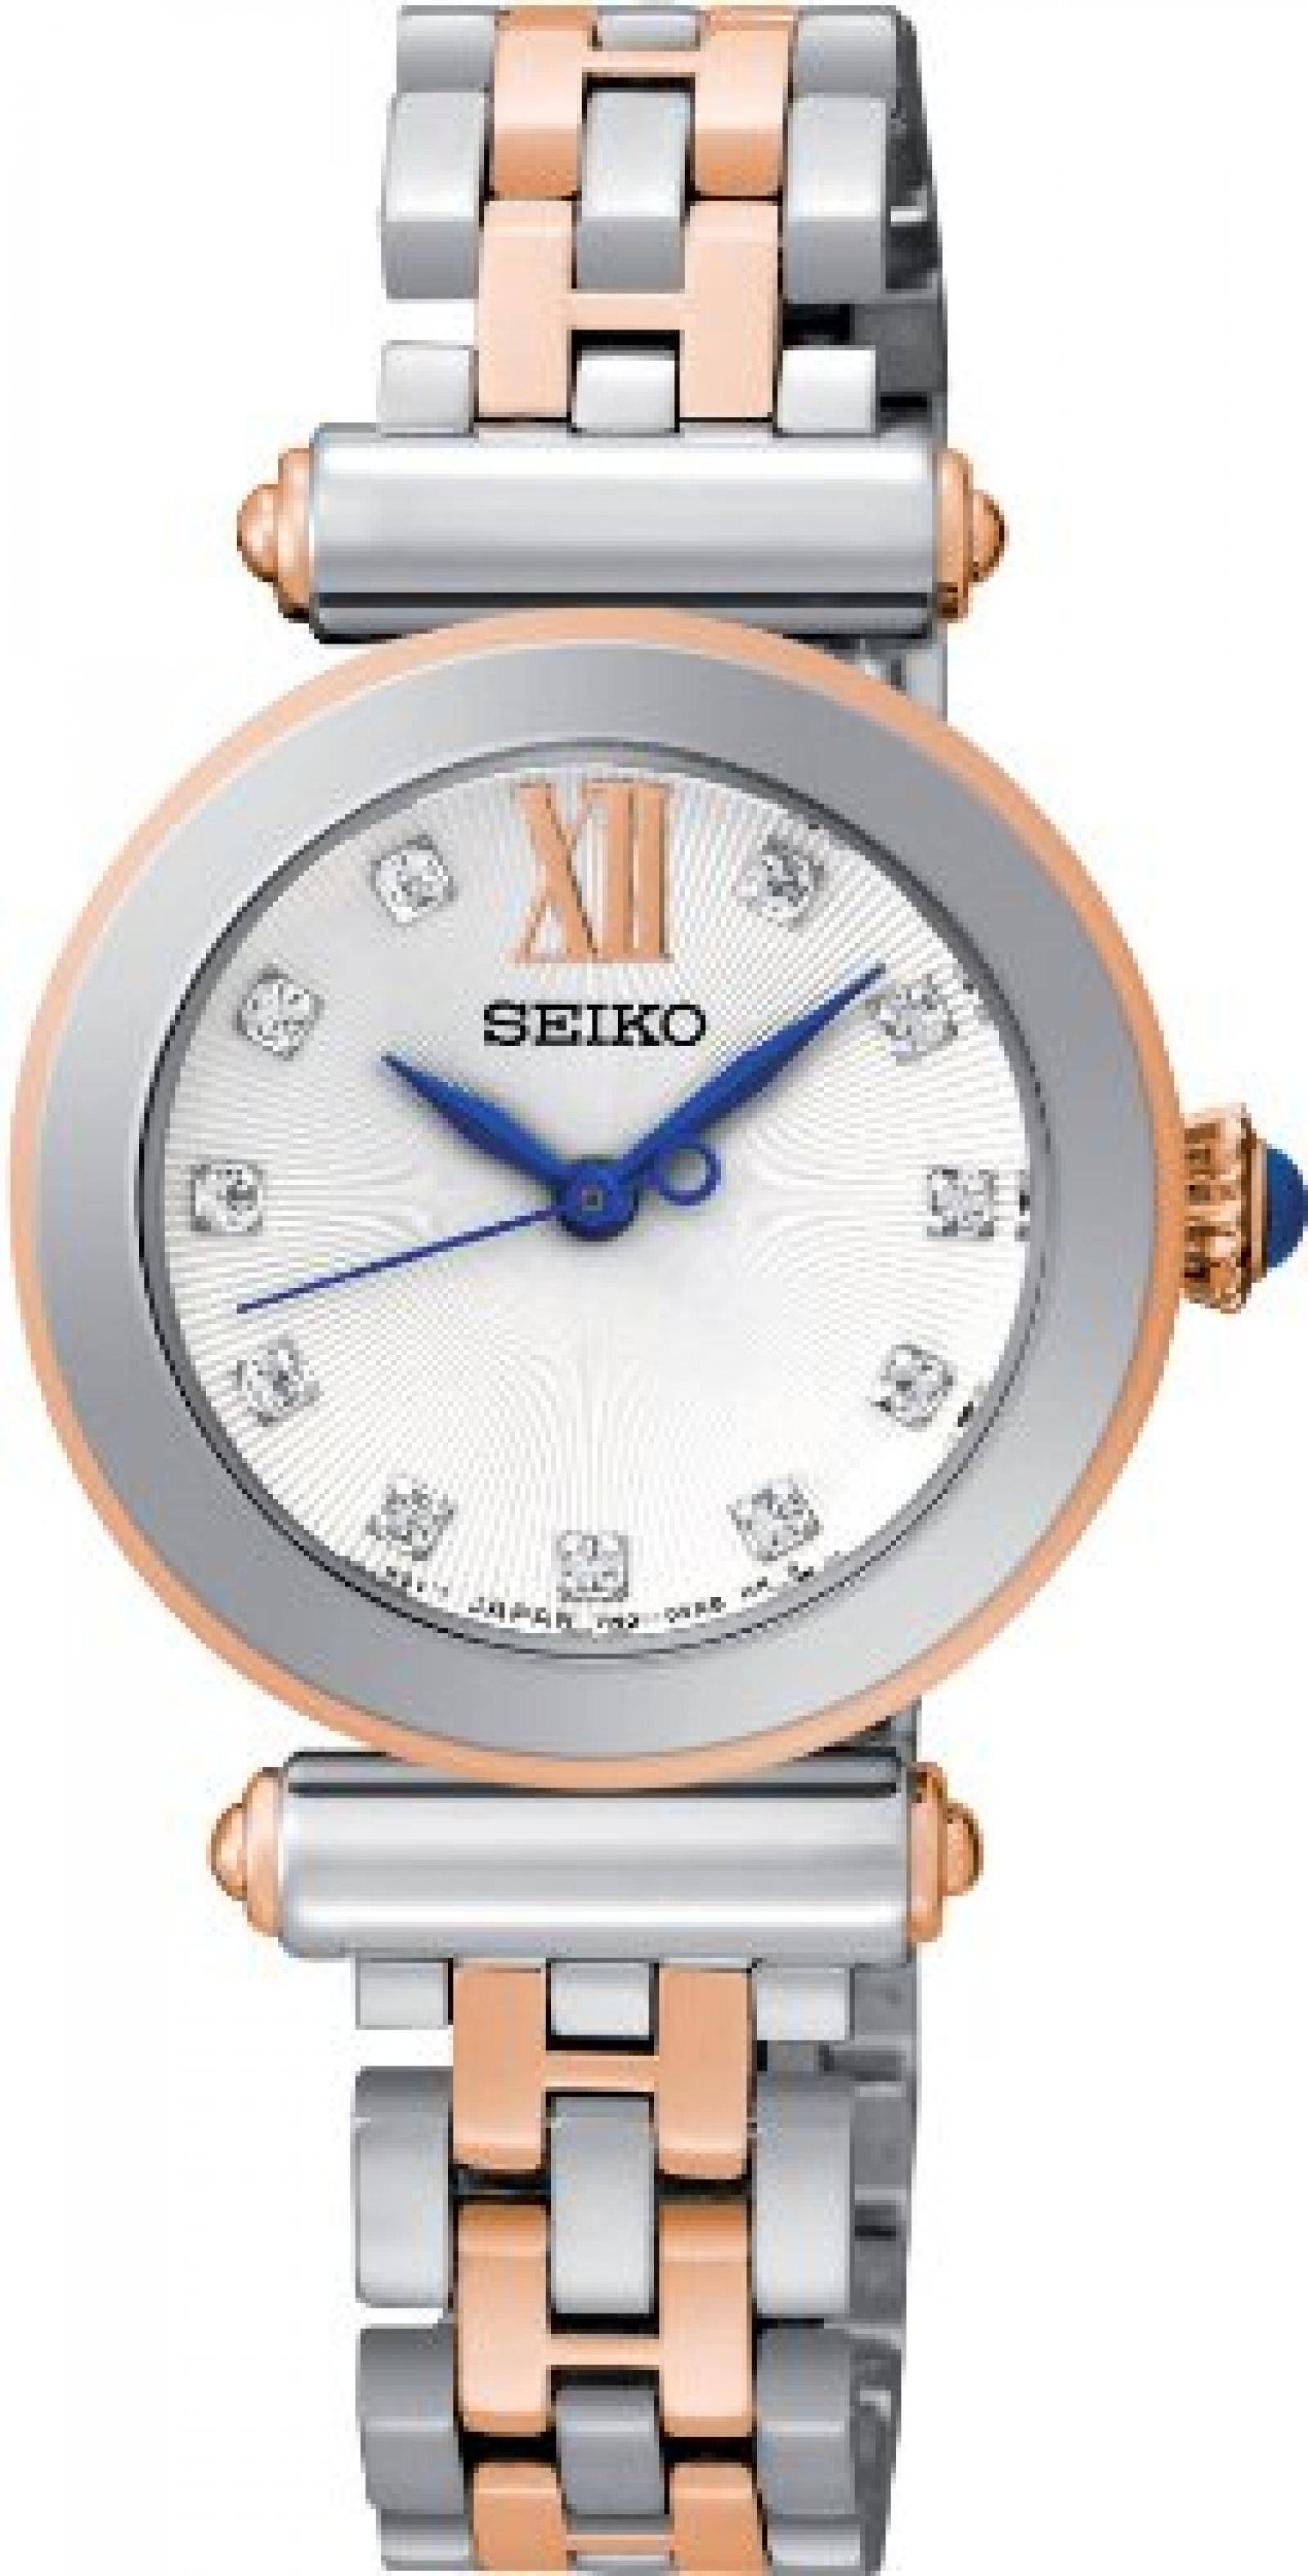 Seiko Damen-Armbanduhr XS Analog Quarz Edelstahl beschichtet SRZ400P1